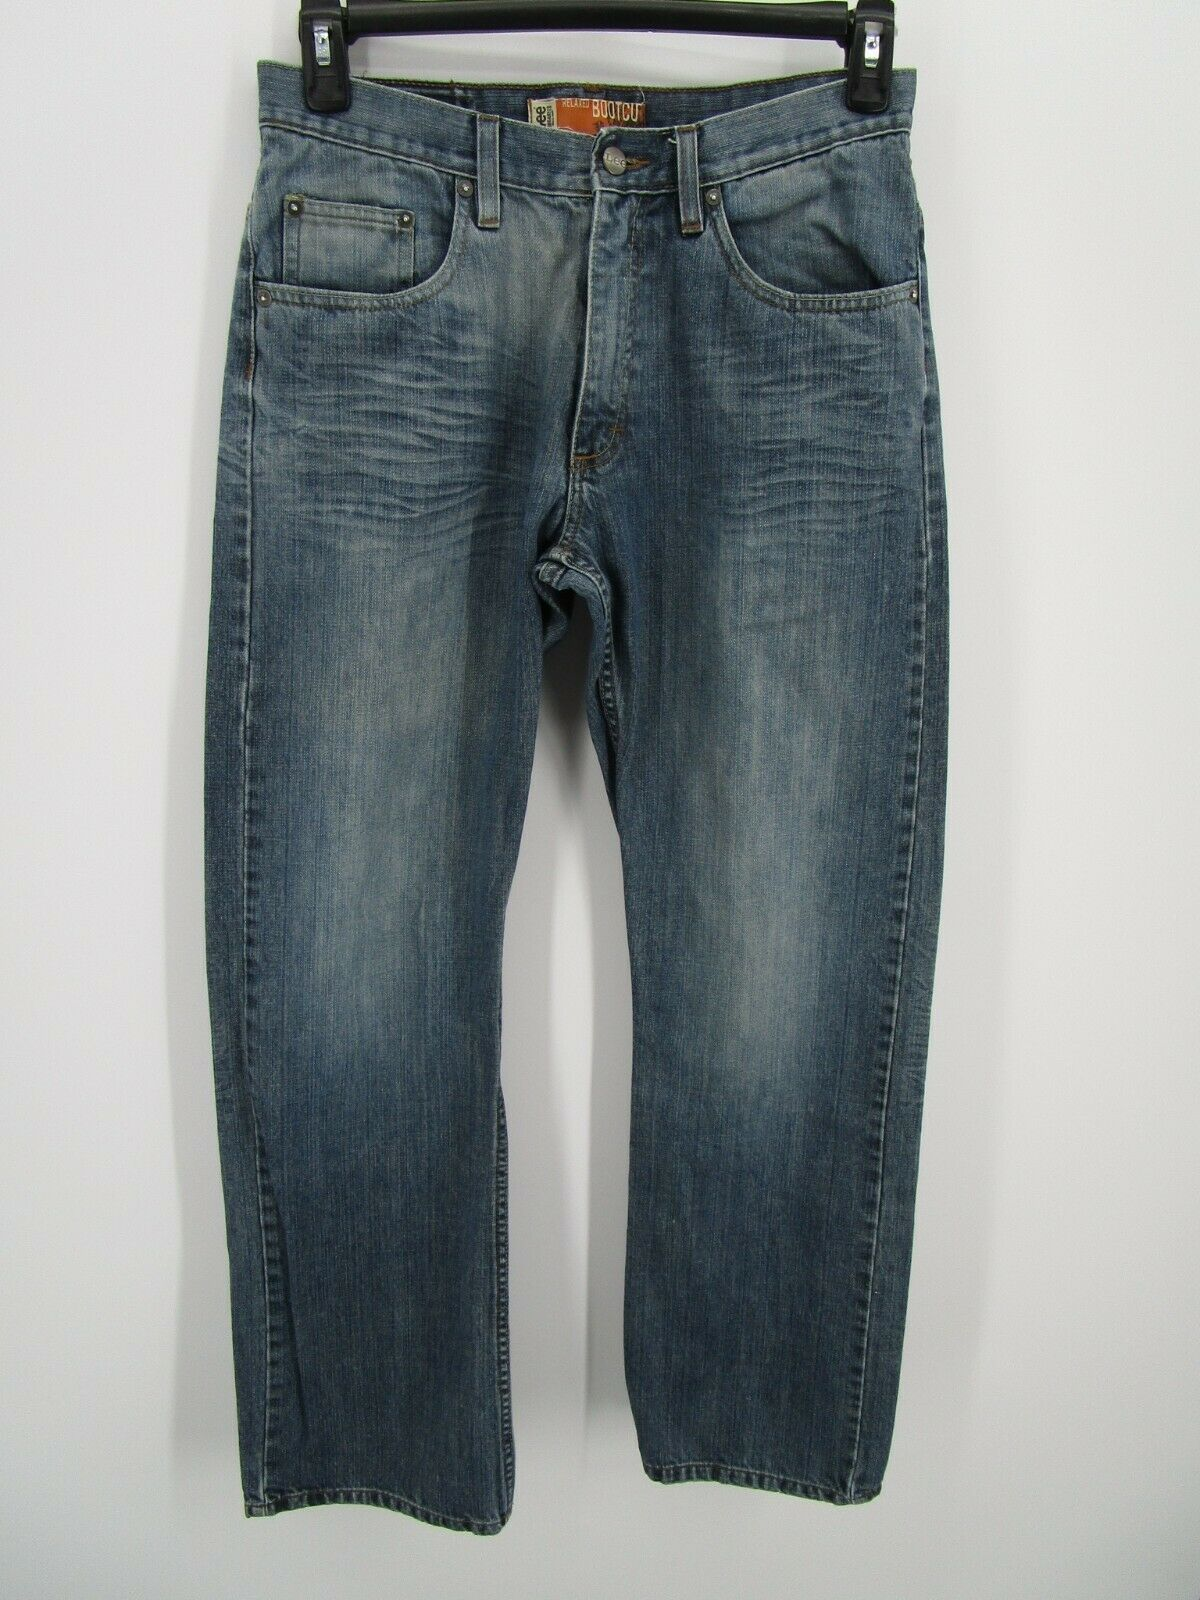 Lee Dungarees Men Size 31X32 Retro Y2K Blue Relax… - image 1